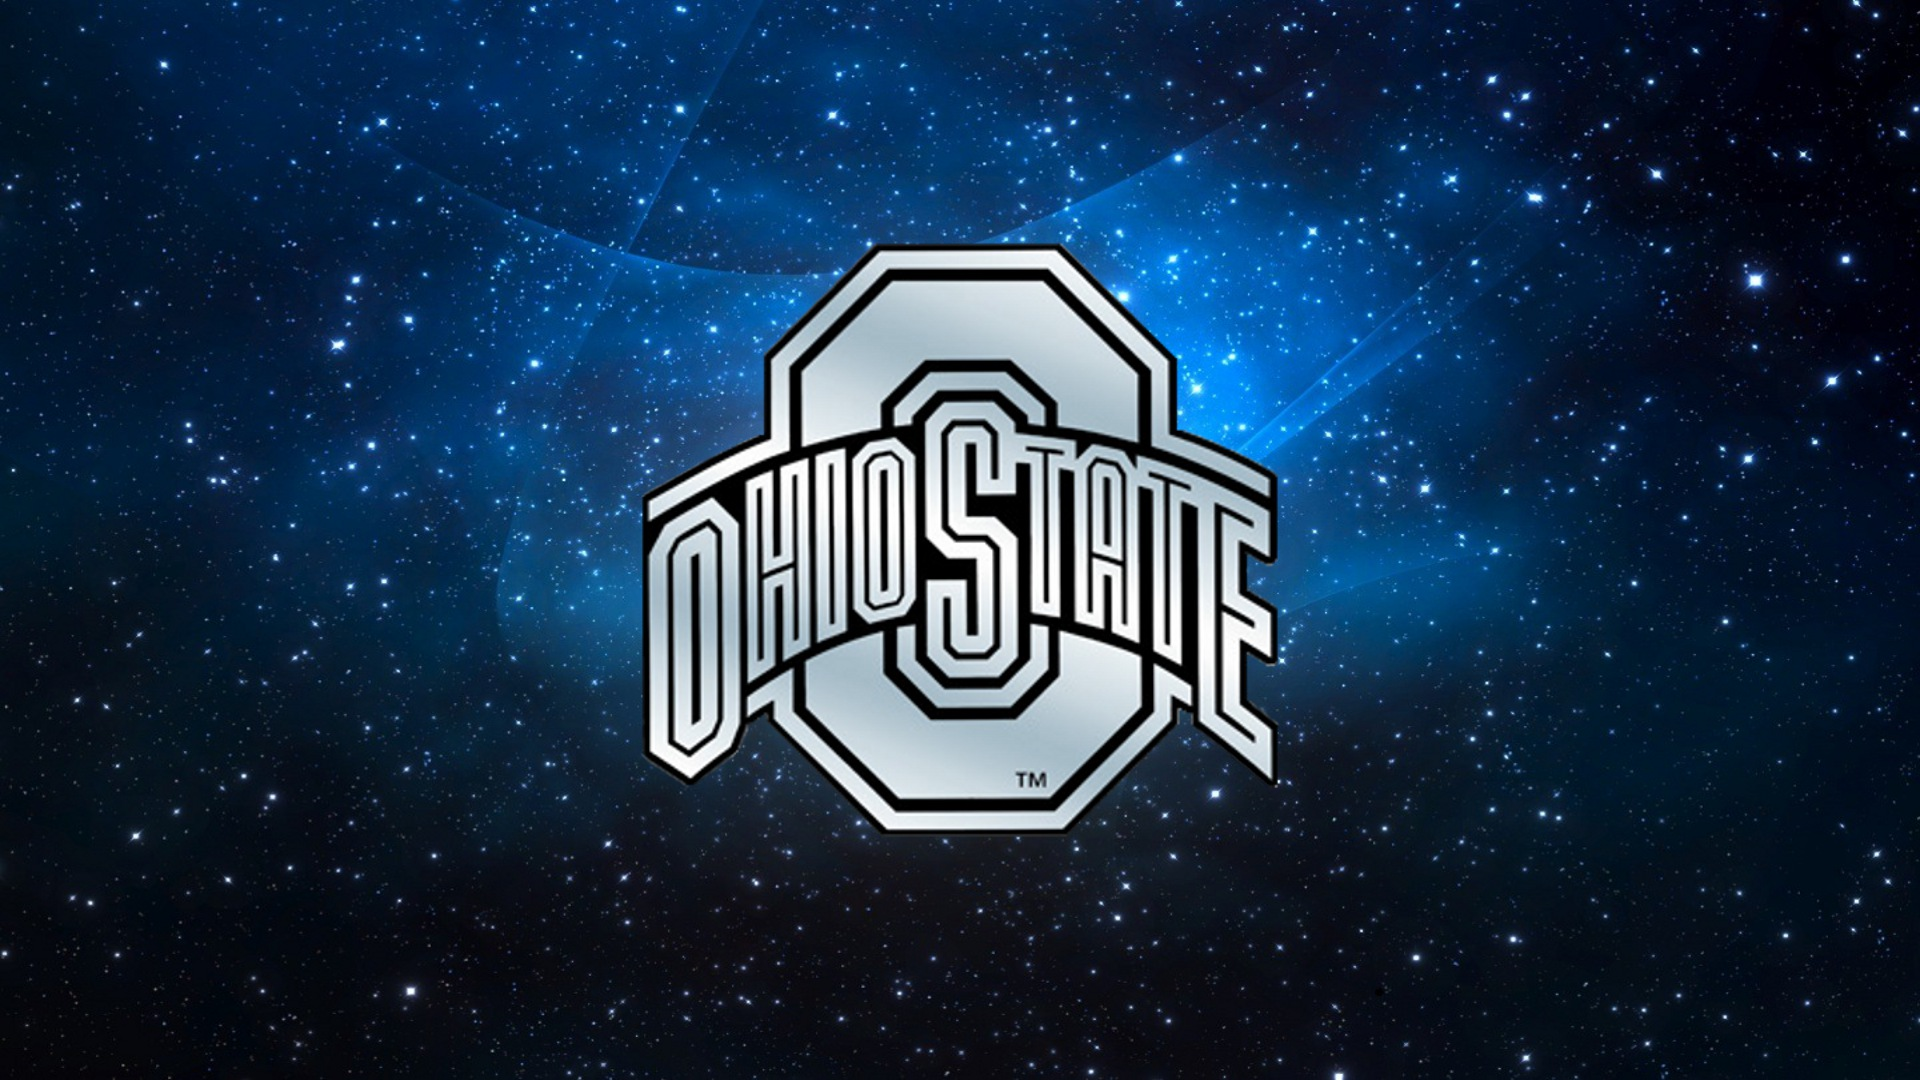 OSU Desktop Wallpaper 129 - Ohio State Football Wallpaper (28971587 ...